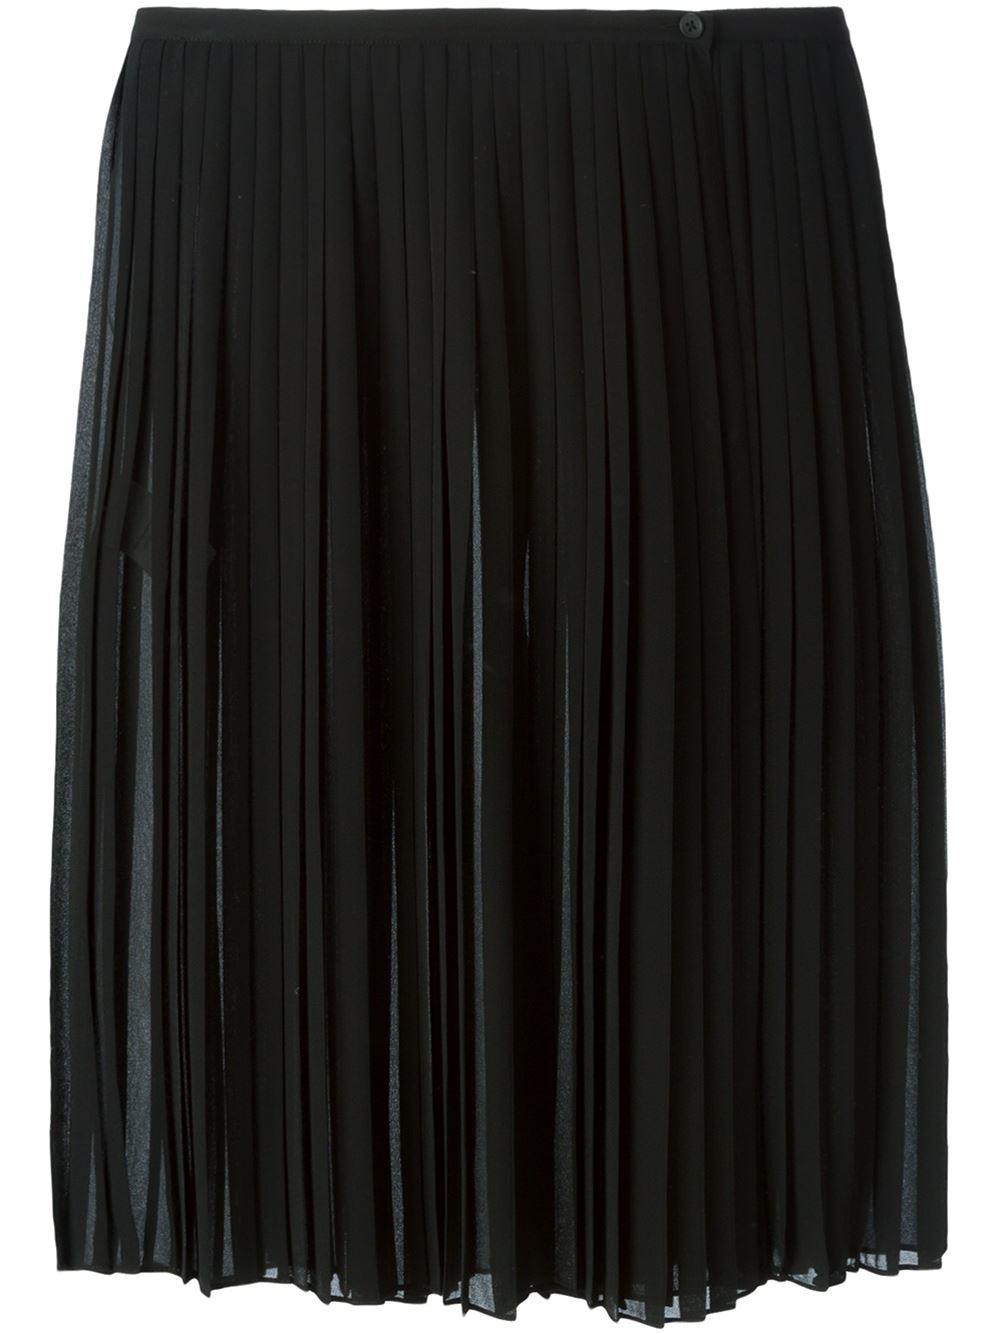 dkny black sheer pleated skirt lyst